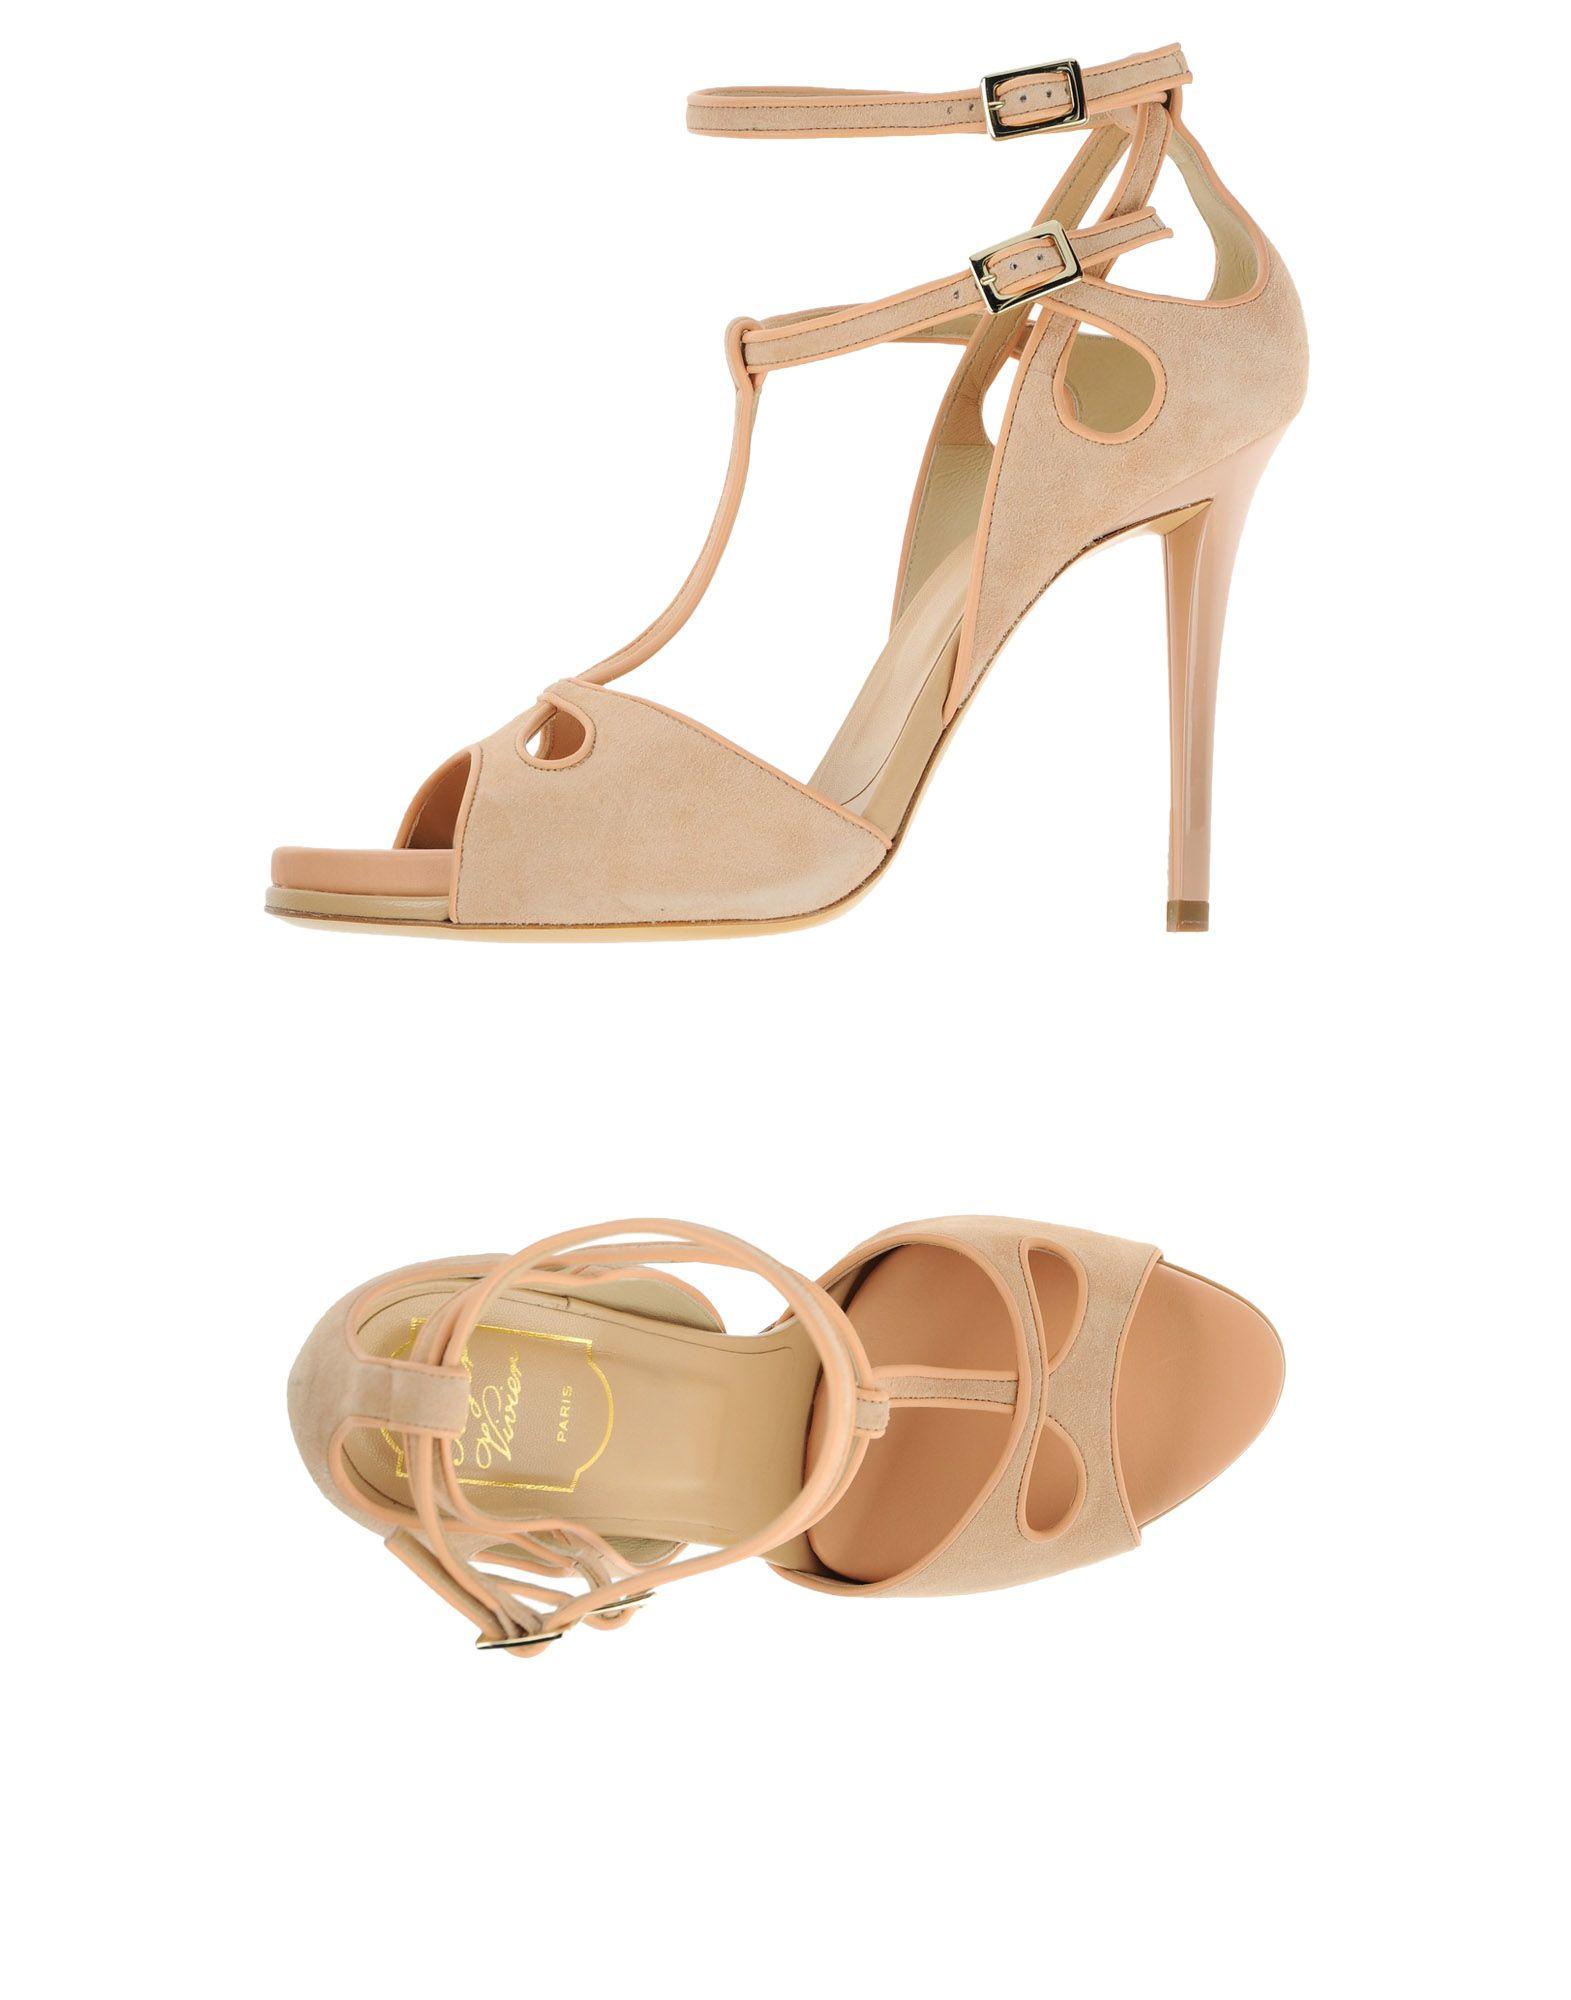 Roger Vivier Sandalen Damen  44993499JUGut aussehende strapazierfähige Schuhe